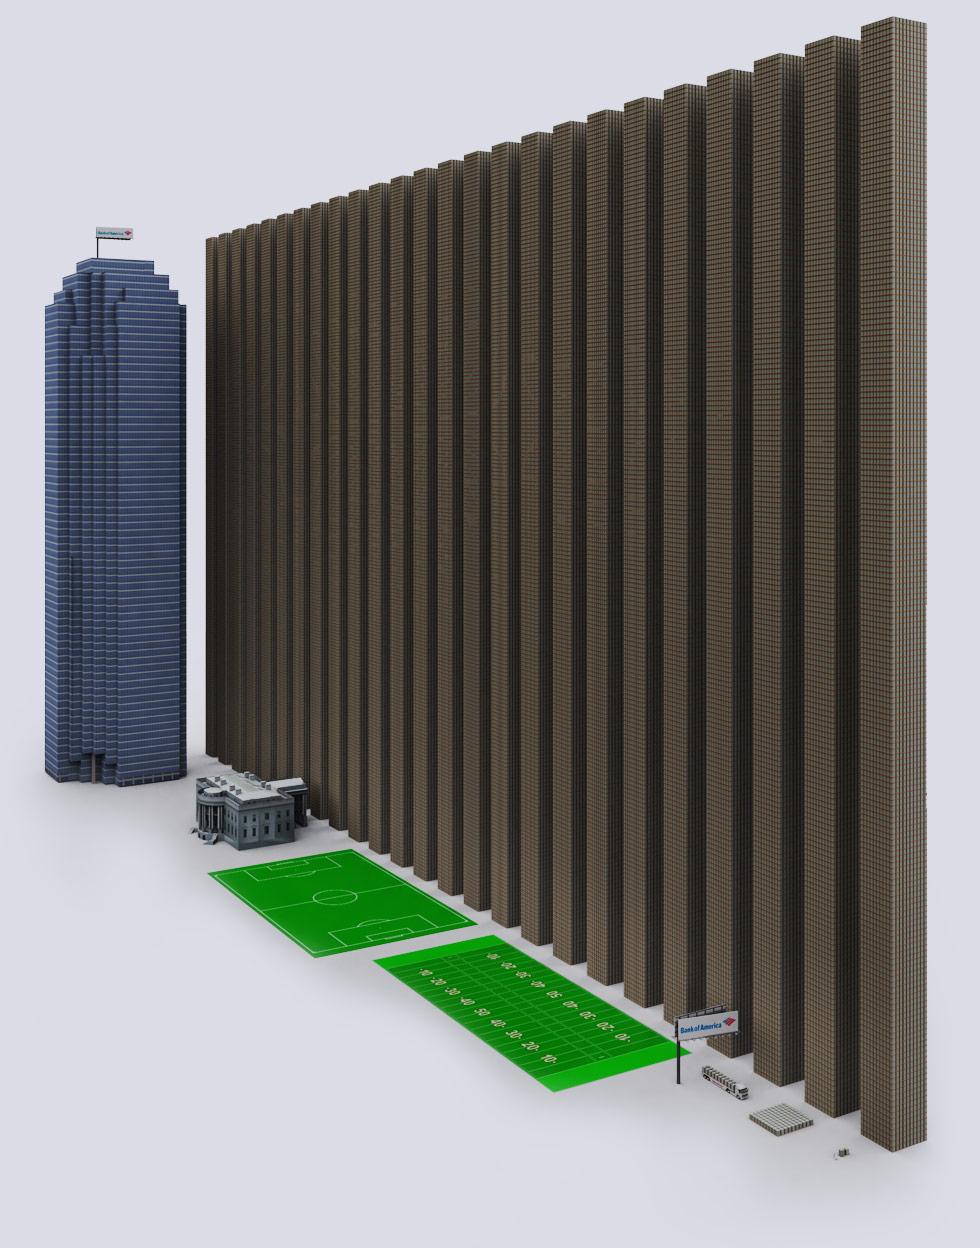 1 Trillion Dollars Looks